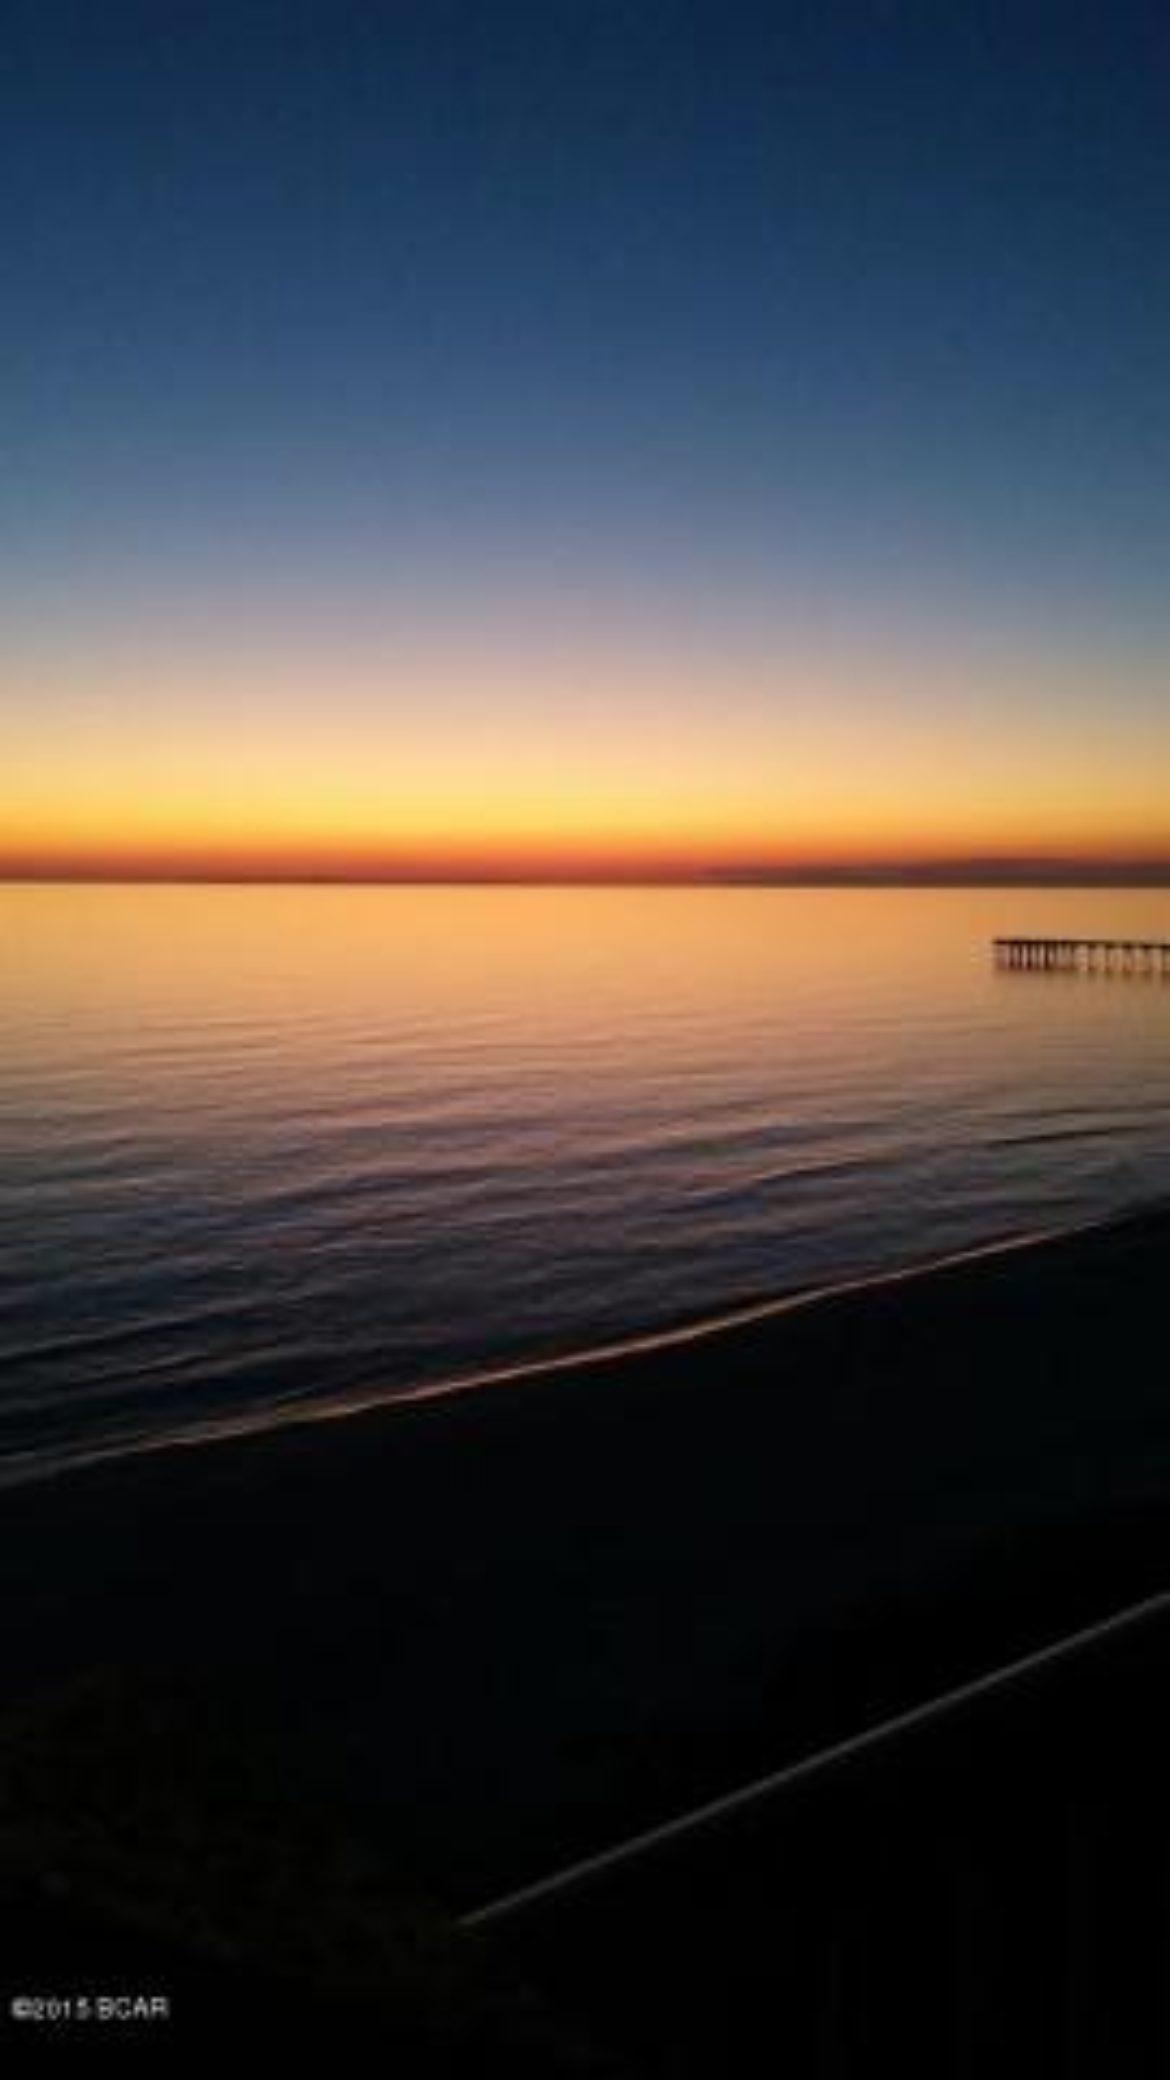 11807 FRONT BEACH Road 1-1105, Panama City Beach, FL 32407